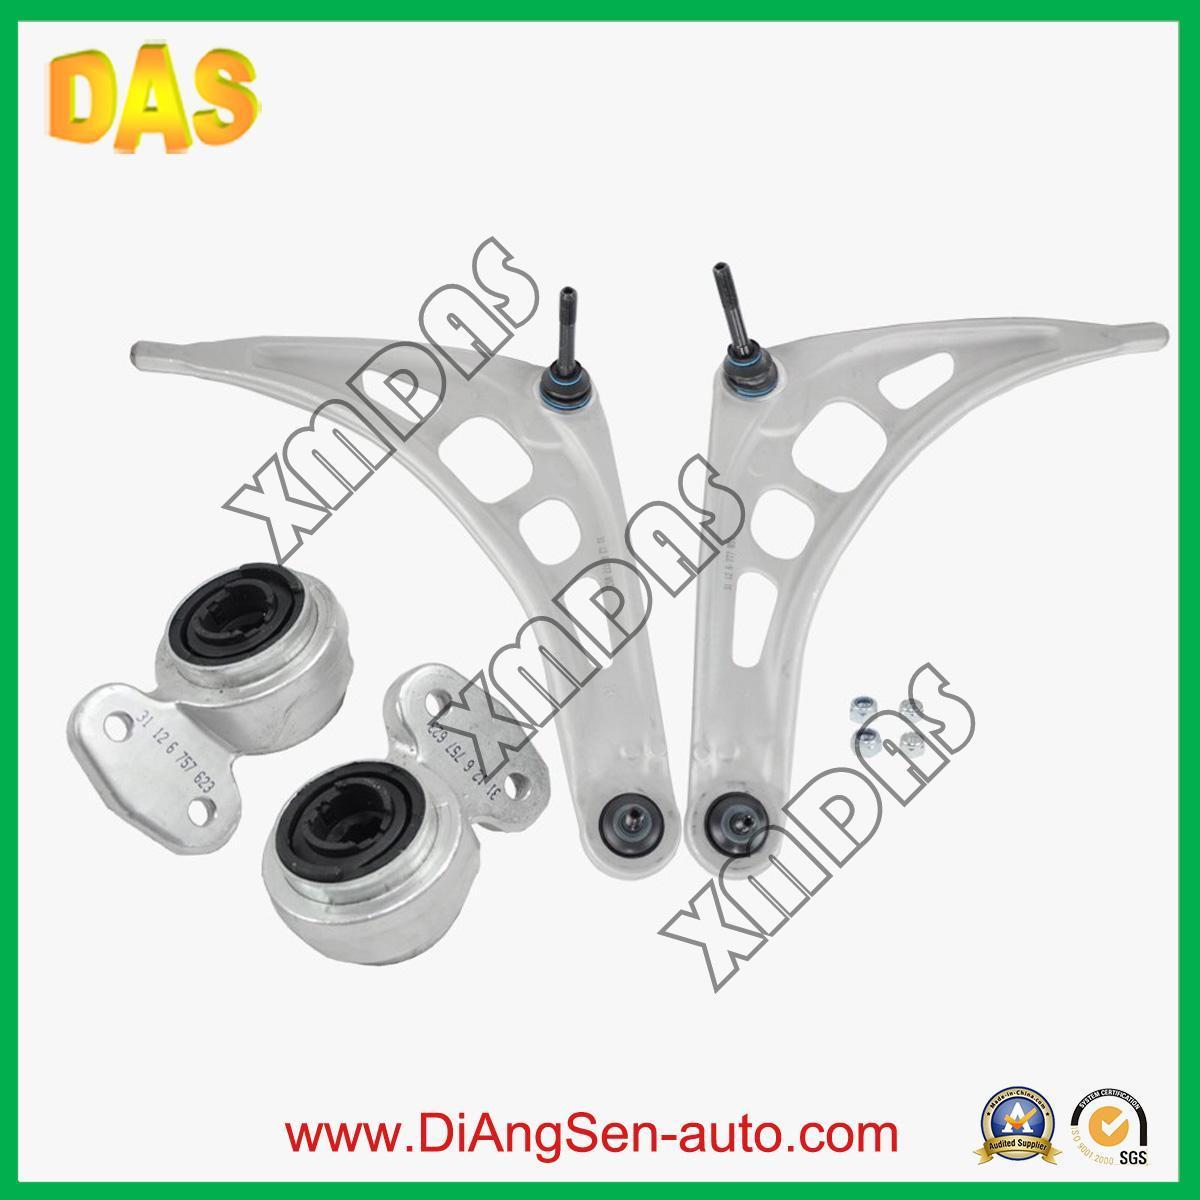 Auto Suspension Parts Lower Control Arm for Nissan X-Trail (54500-8h310RH/54501-8H310LH)